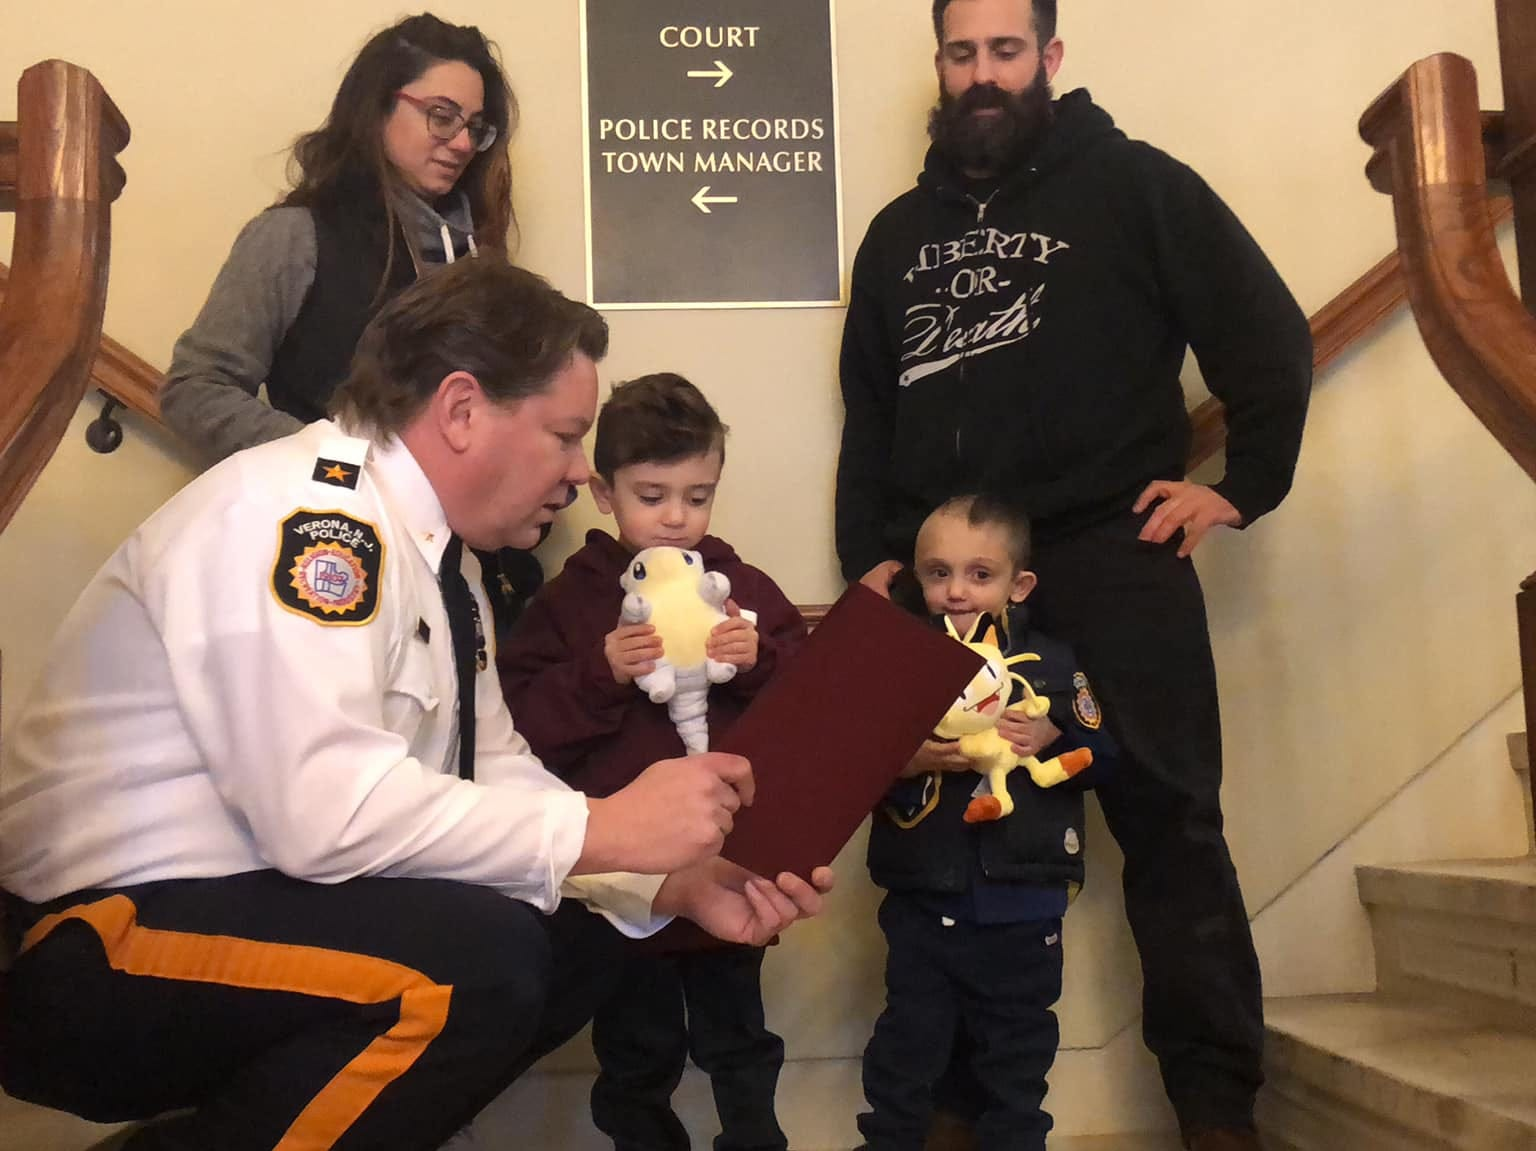 Verona Police Chief Chris Kiernan reads an oath to 4-year-old Micco LaRosa Jan. 20, 2019.